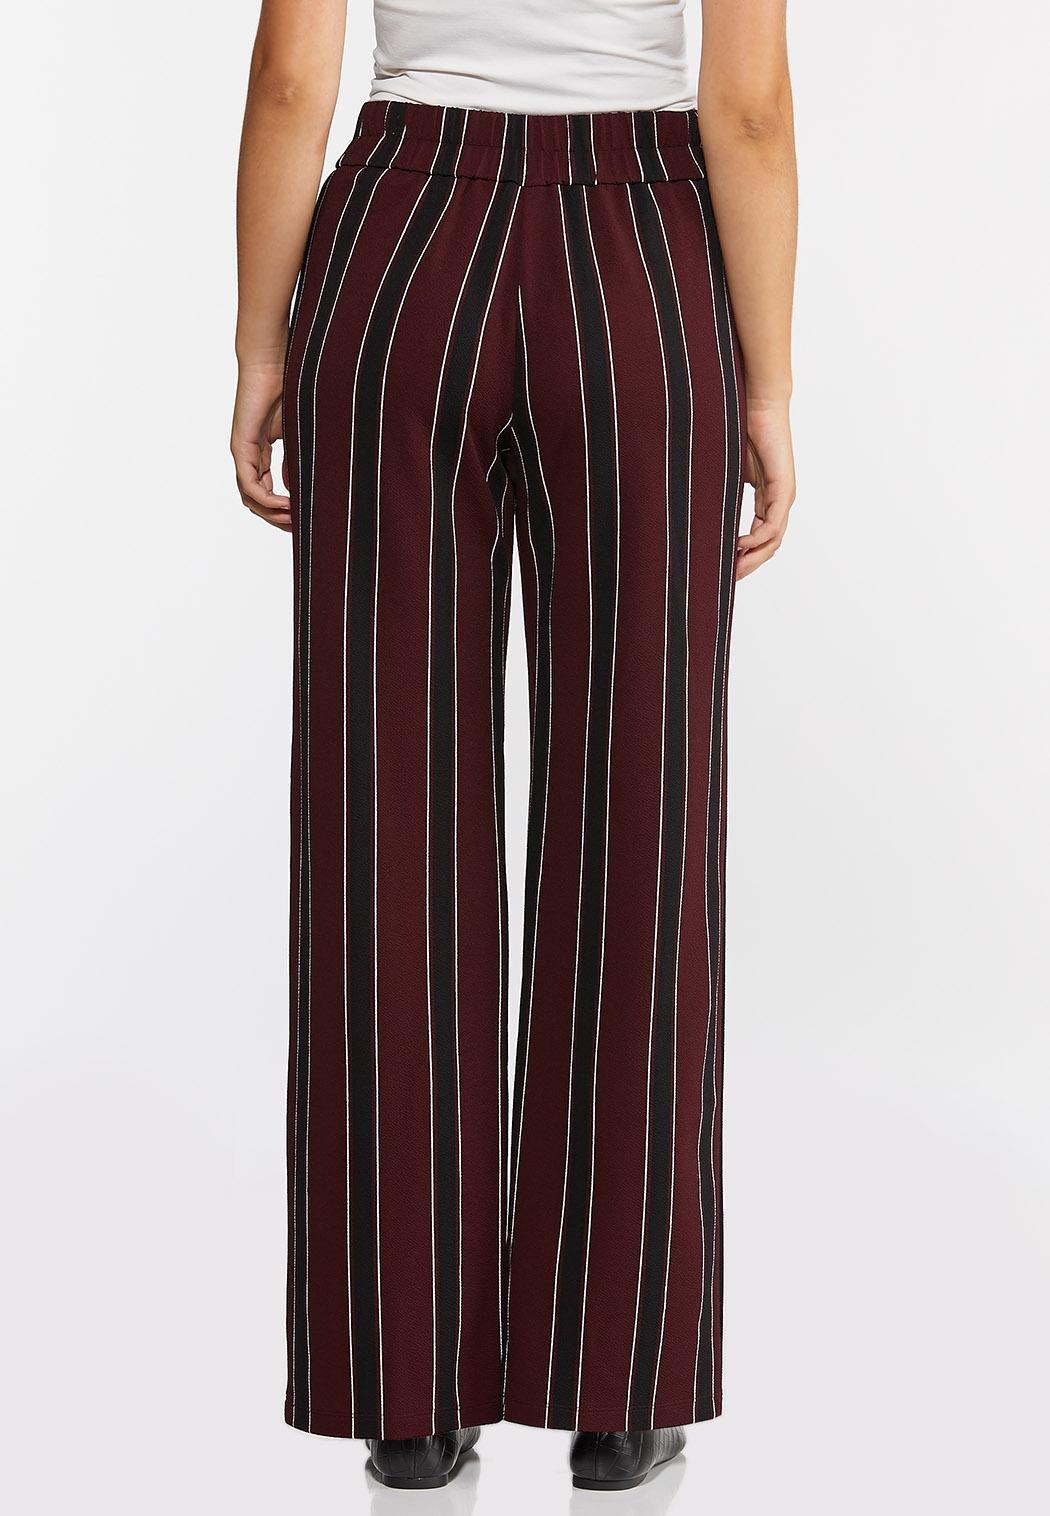 Striped Wide Leg Pants (Item #44314366)